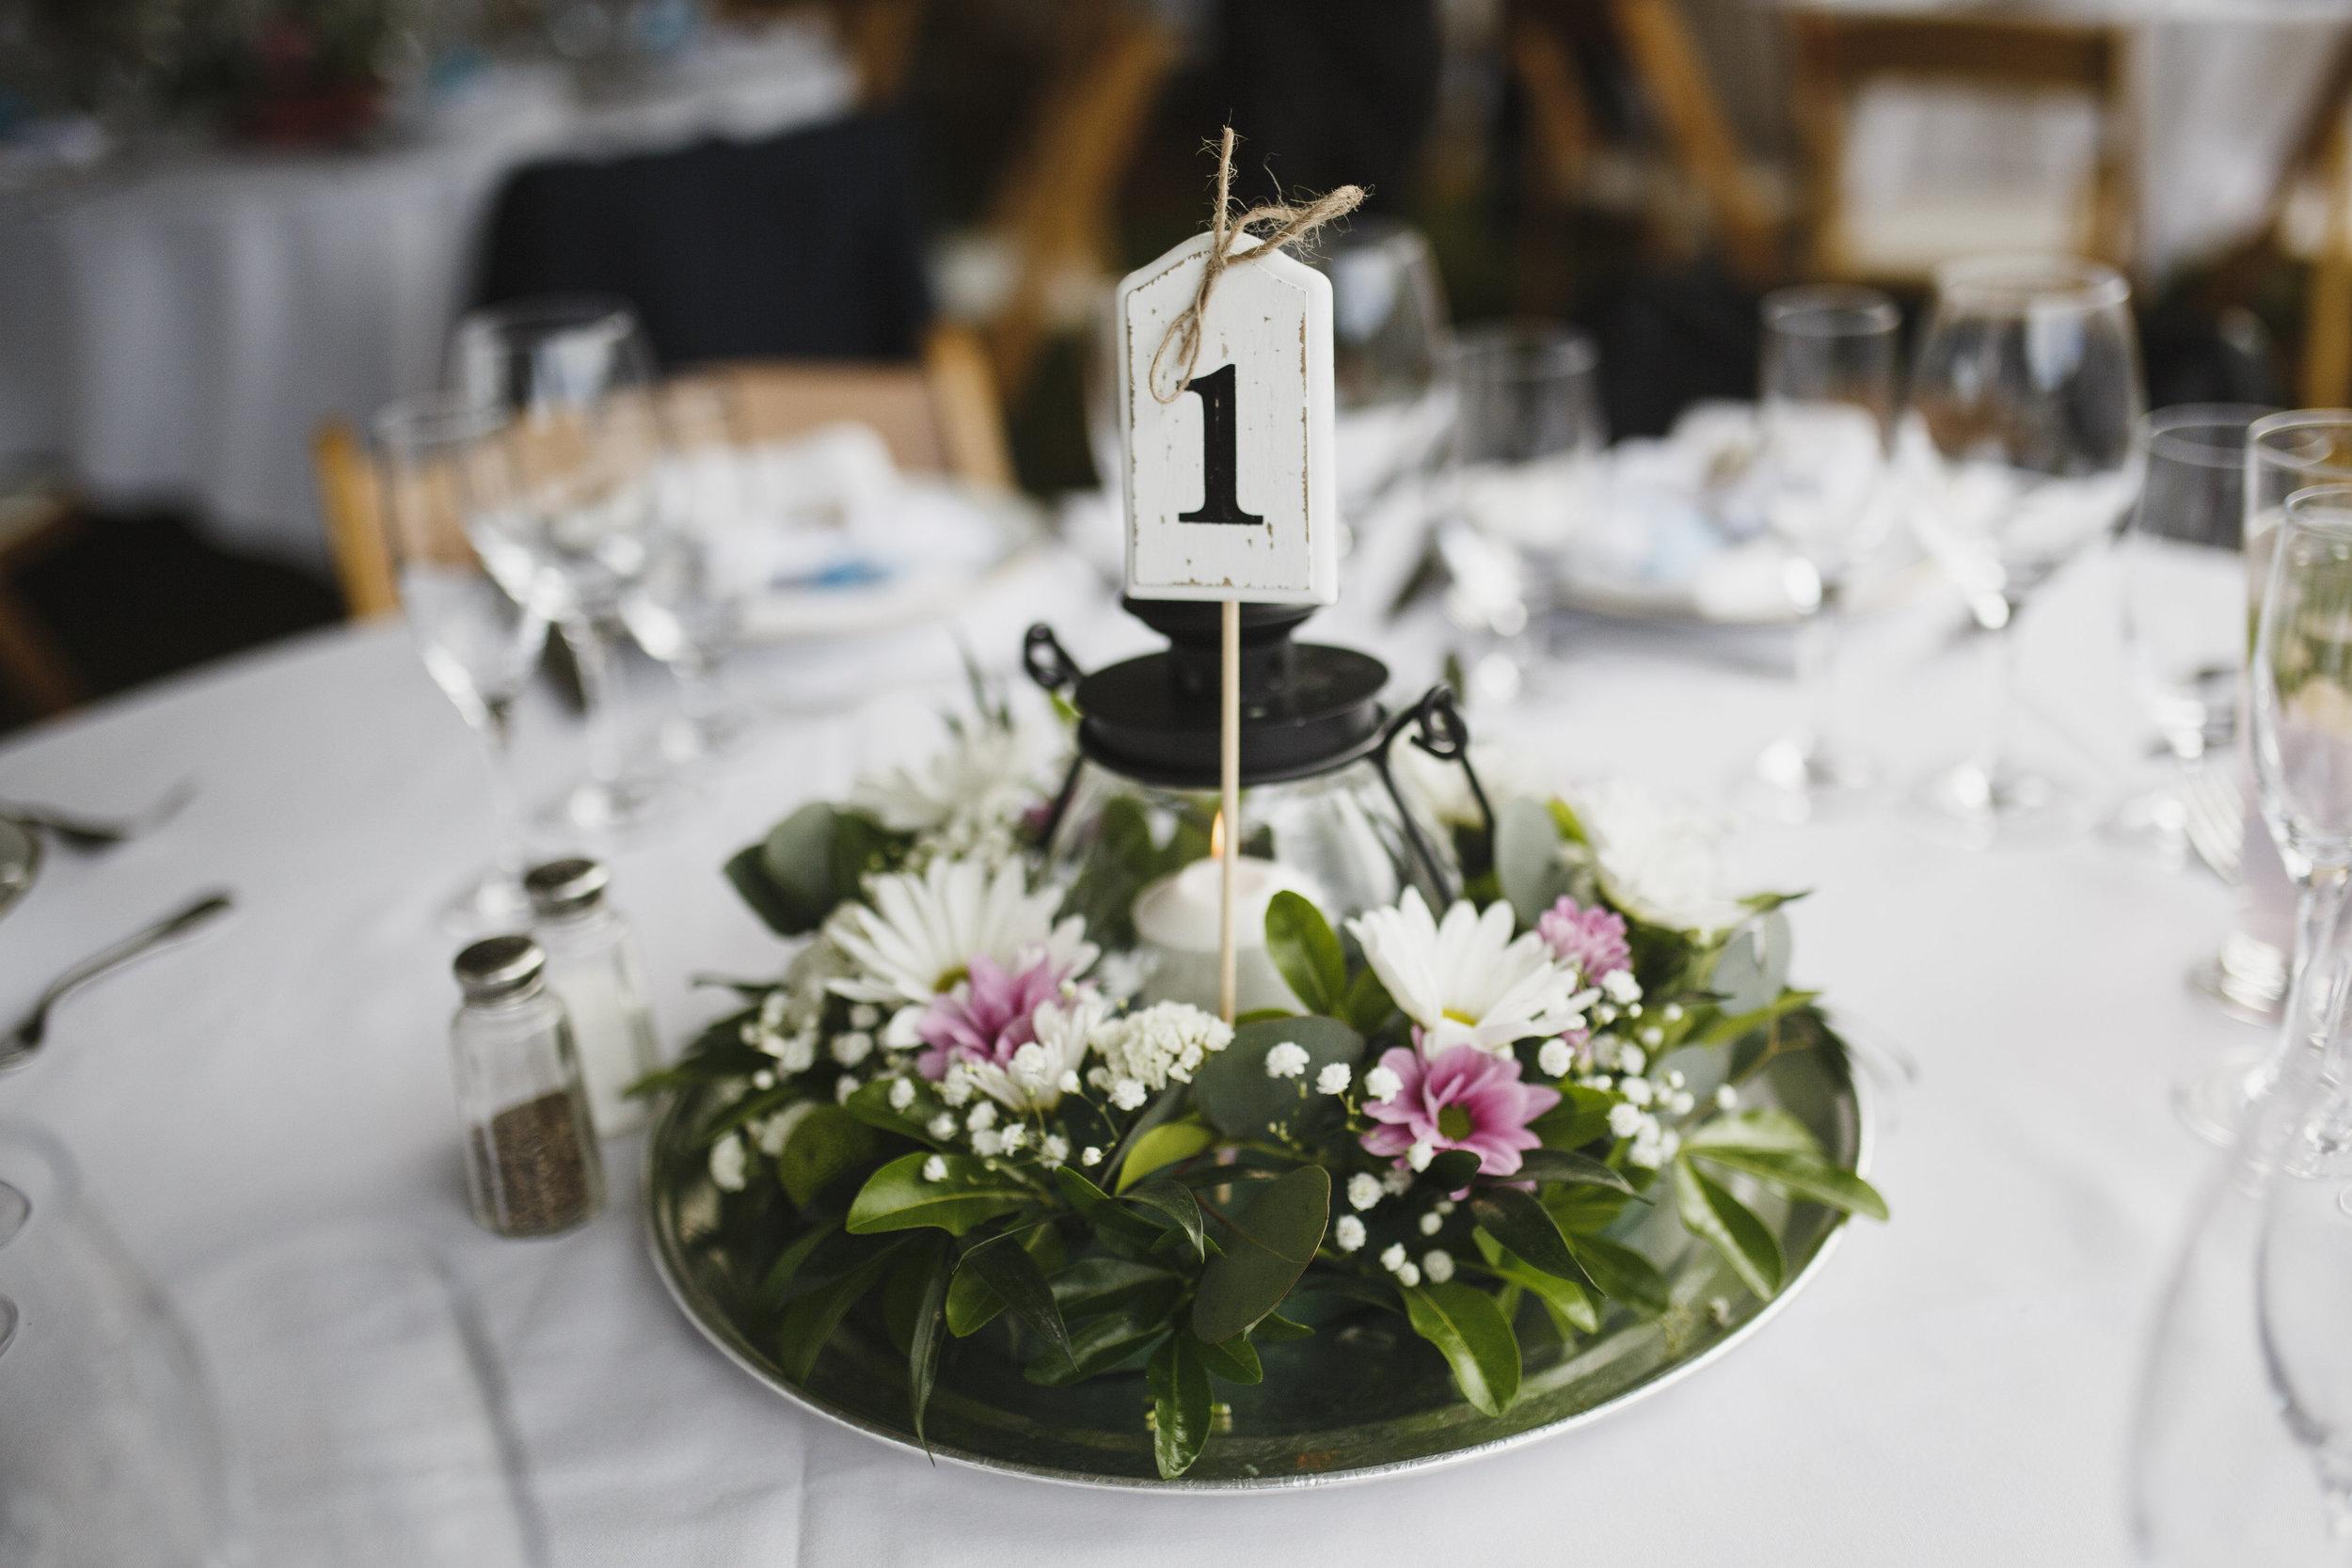 The table at the reception Beach wedding Tofino Sea Cider Vancouver Island